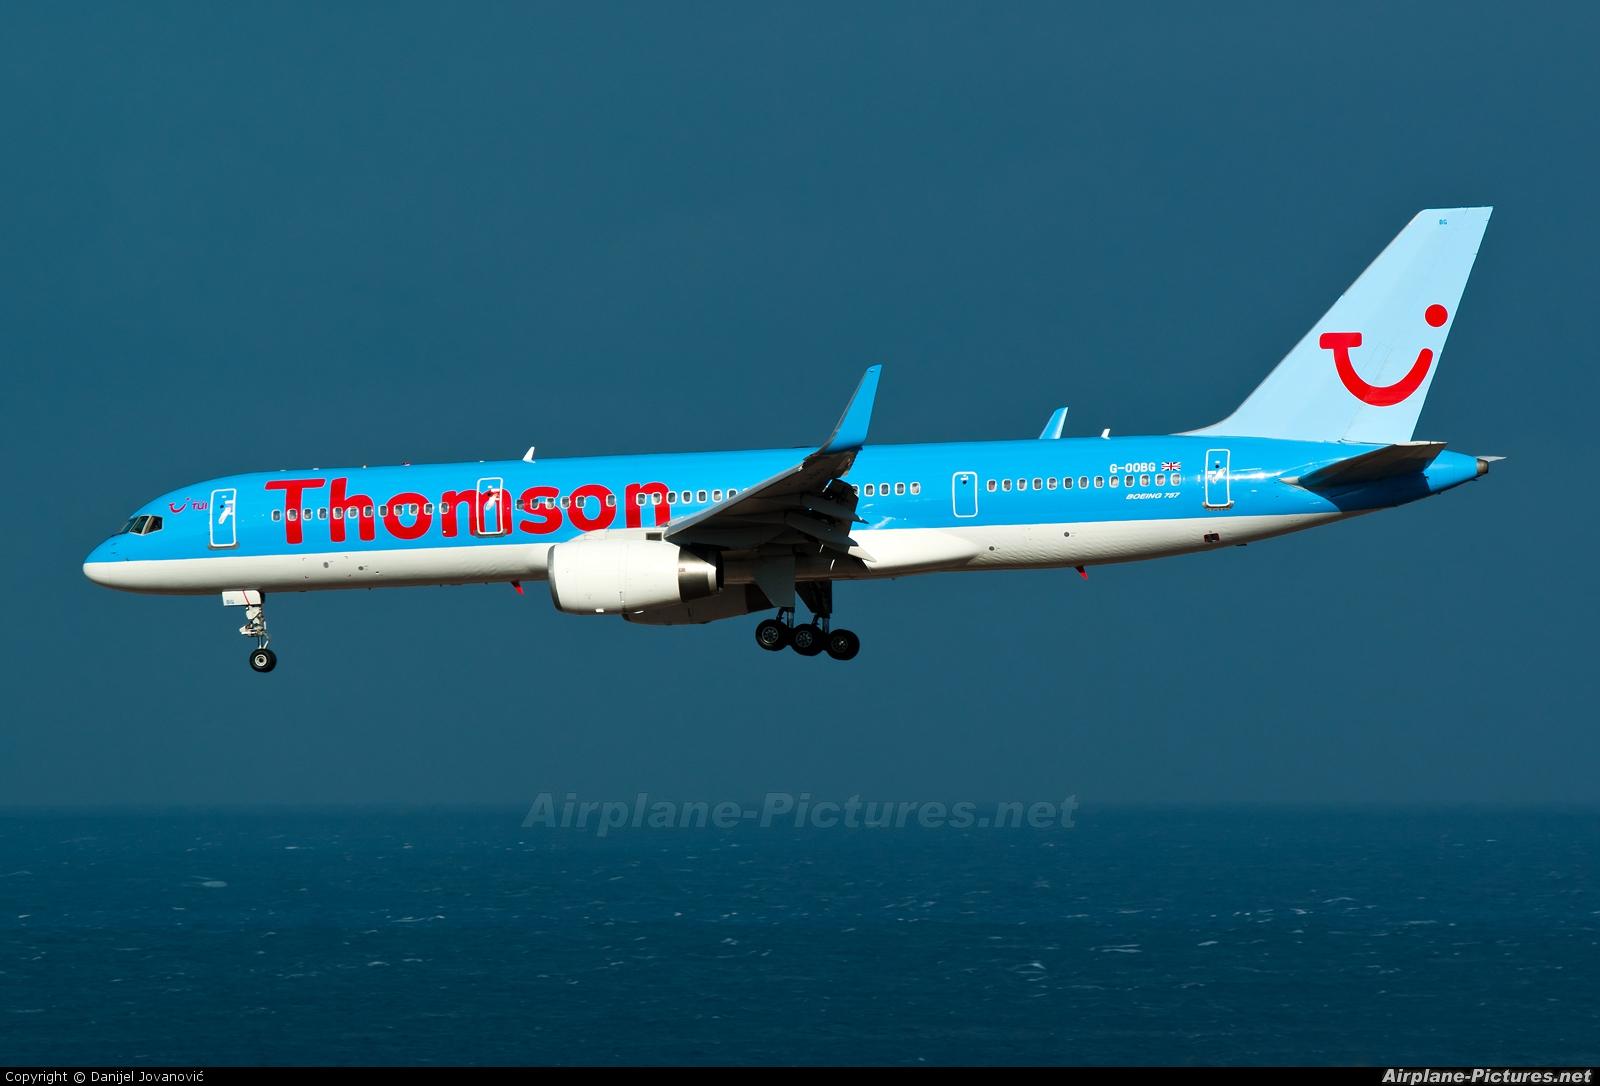 Thomson/Thomsonfly G-OOBG aircraft at Las Palmas de Gran Canaria